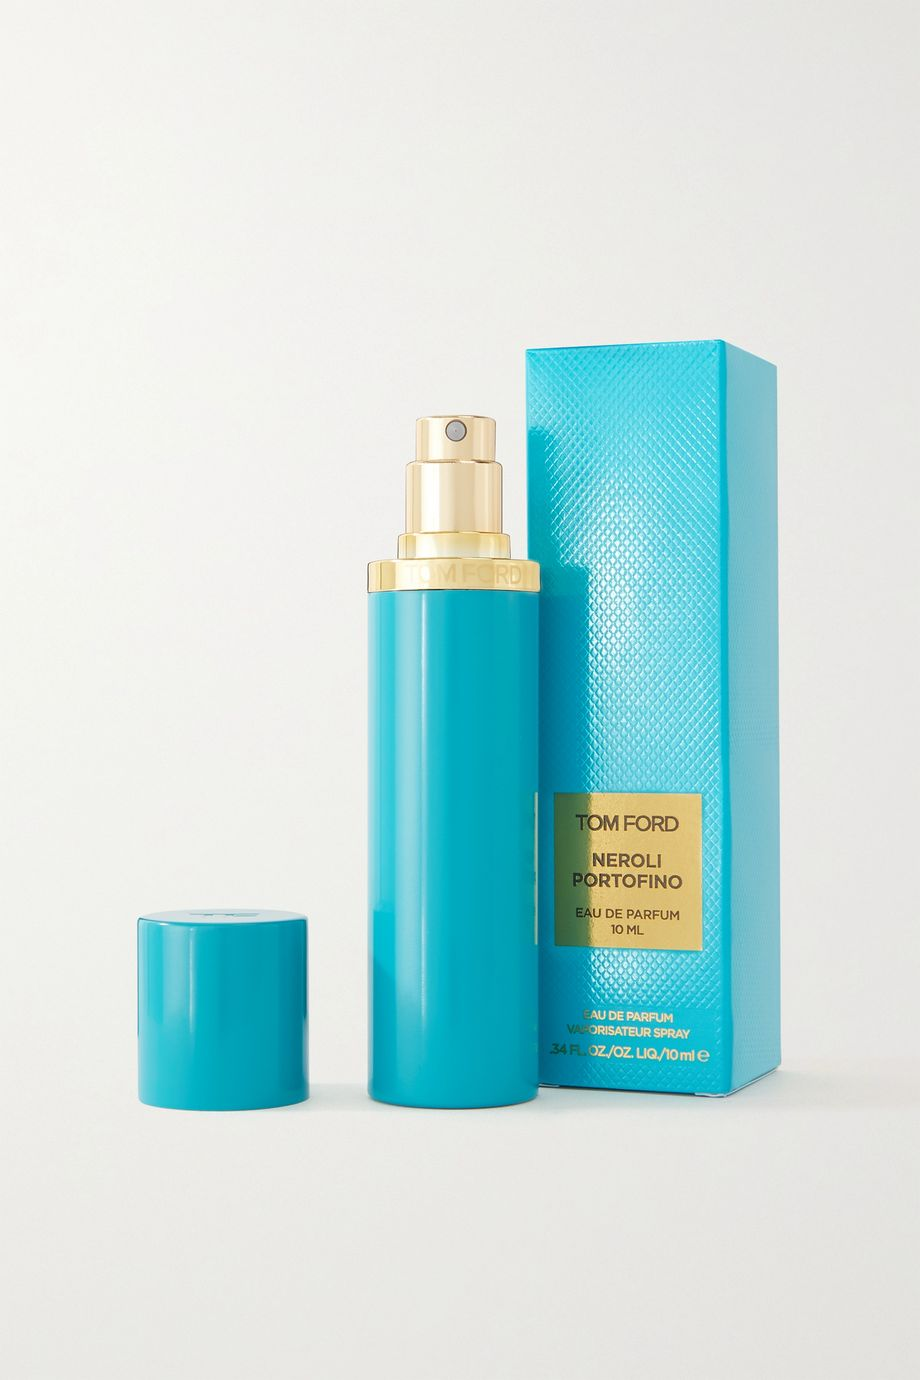 TOM FORD BEAUTY Neroli Portofino Eau de Parfum, 10ml